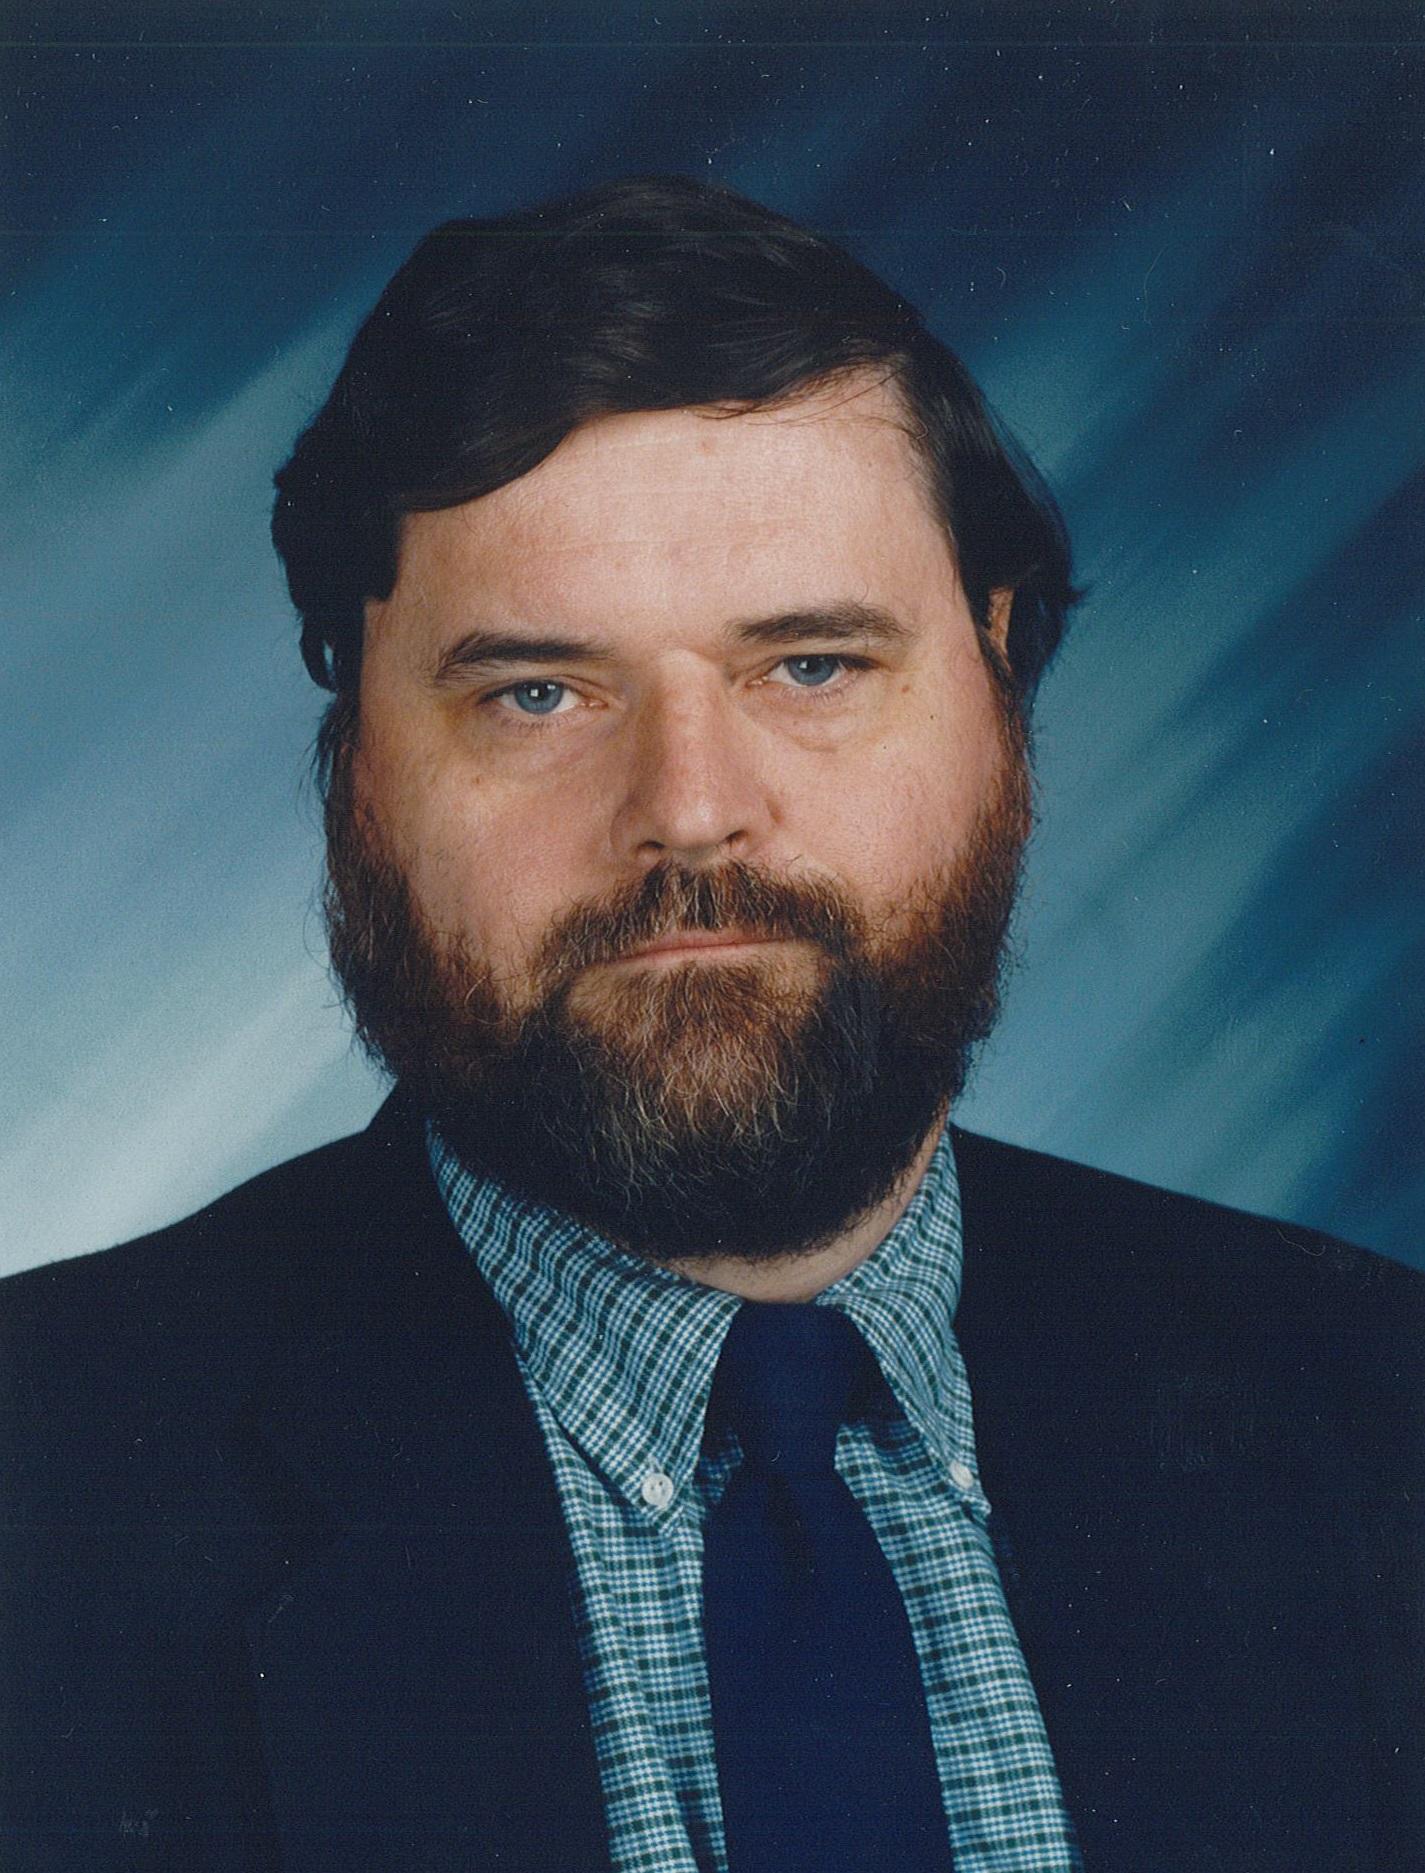 Danton Albright Ponzol